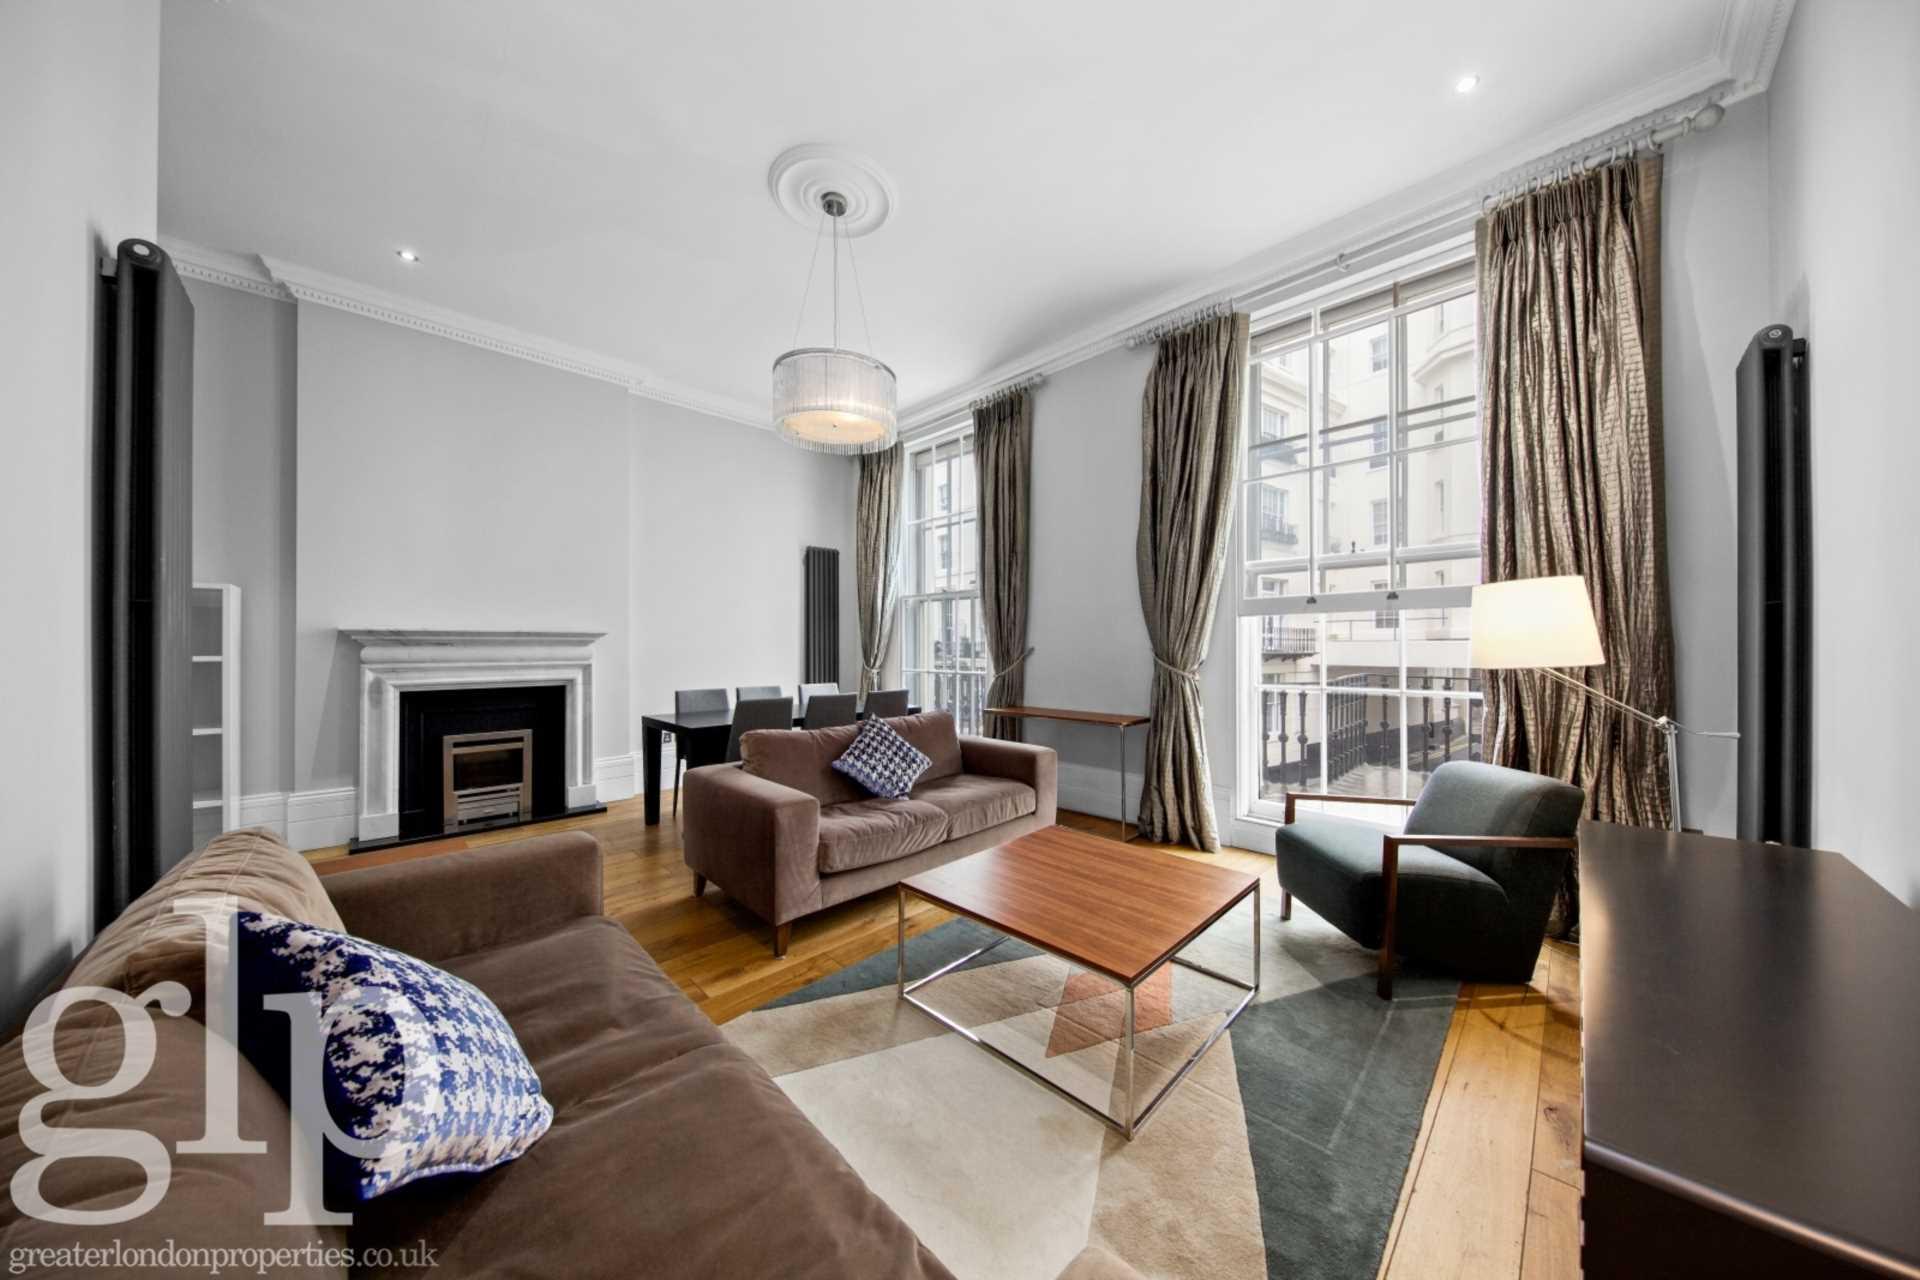 6984 1, Greater London Properties